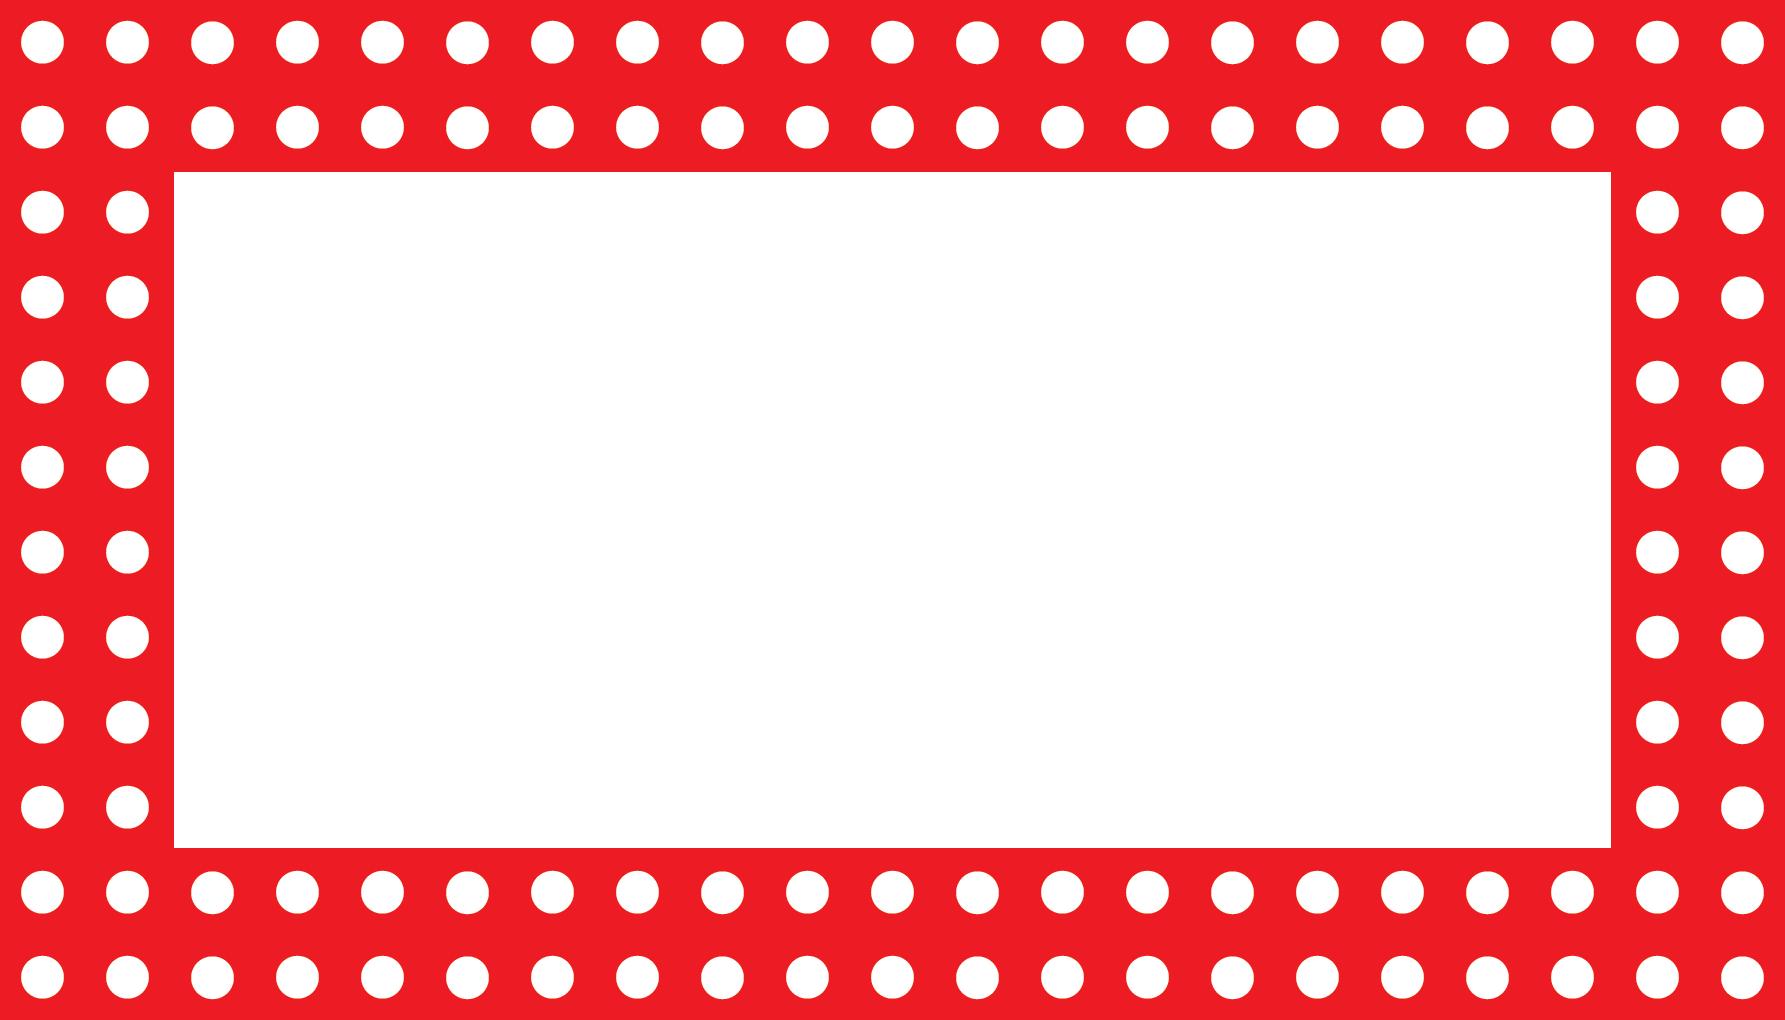 Red dots randen en. Label clipart polka dot